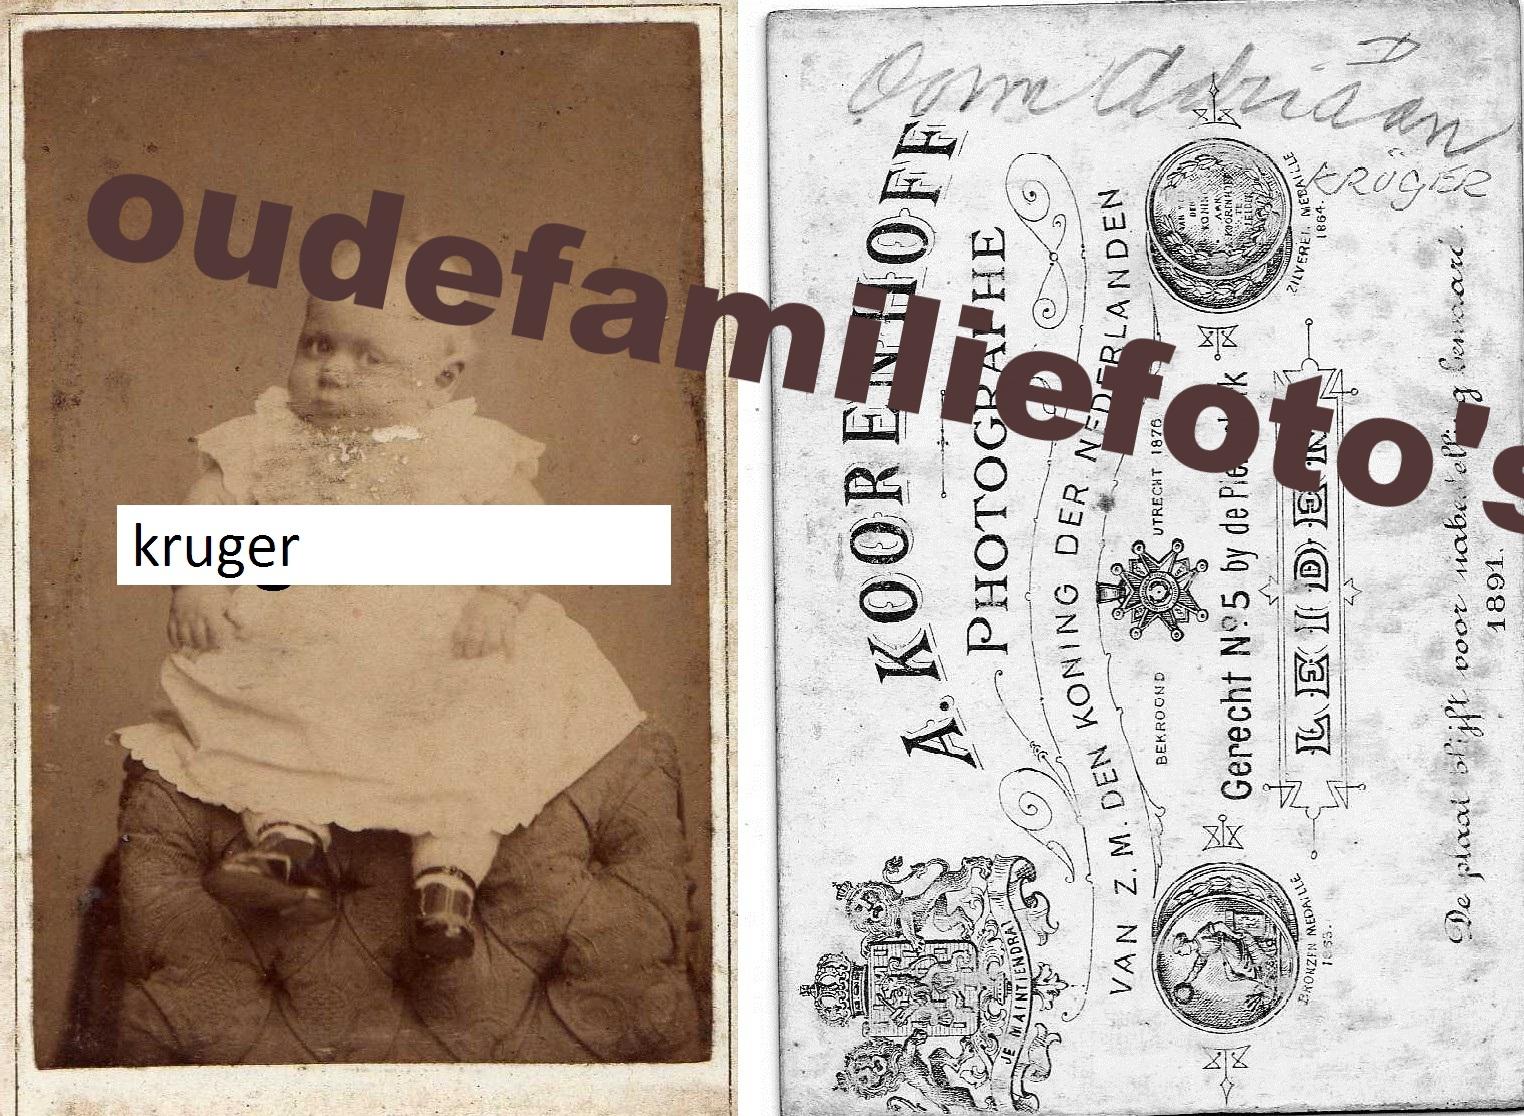 Kruger, Adriaan Willem Johan. geb. 8-5-1891 Leiden